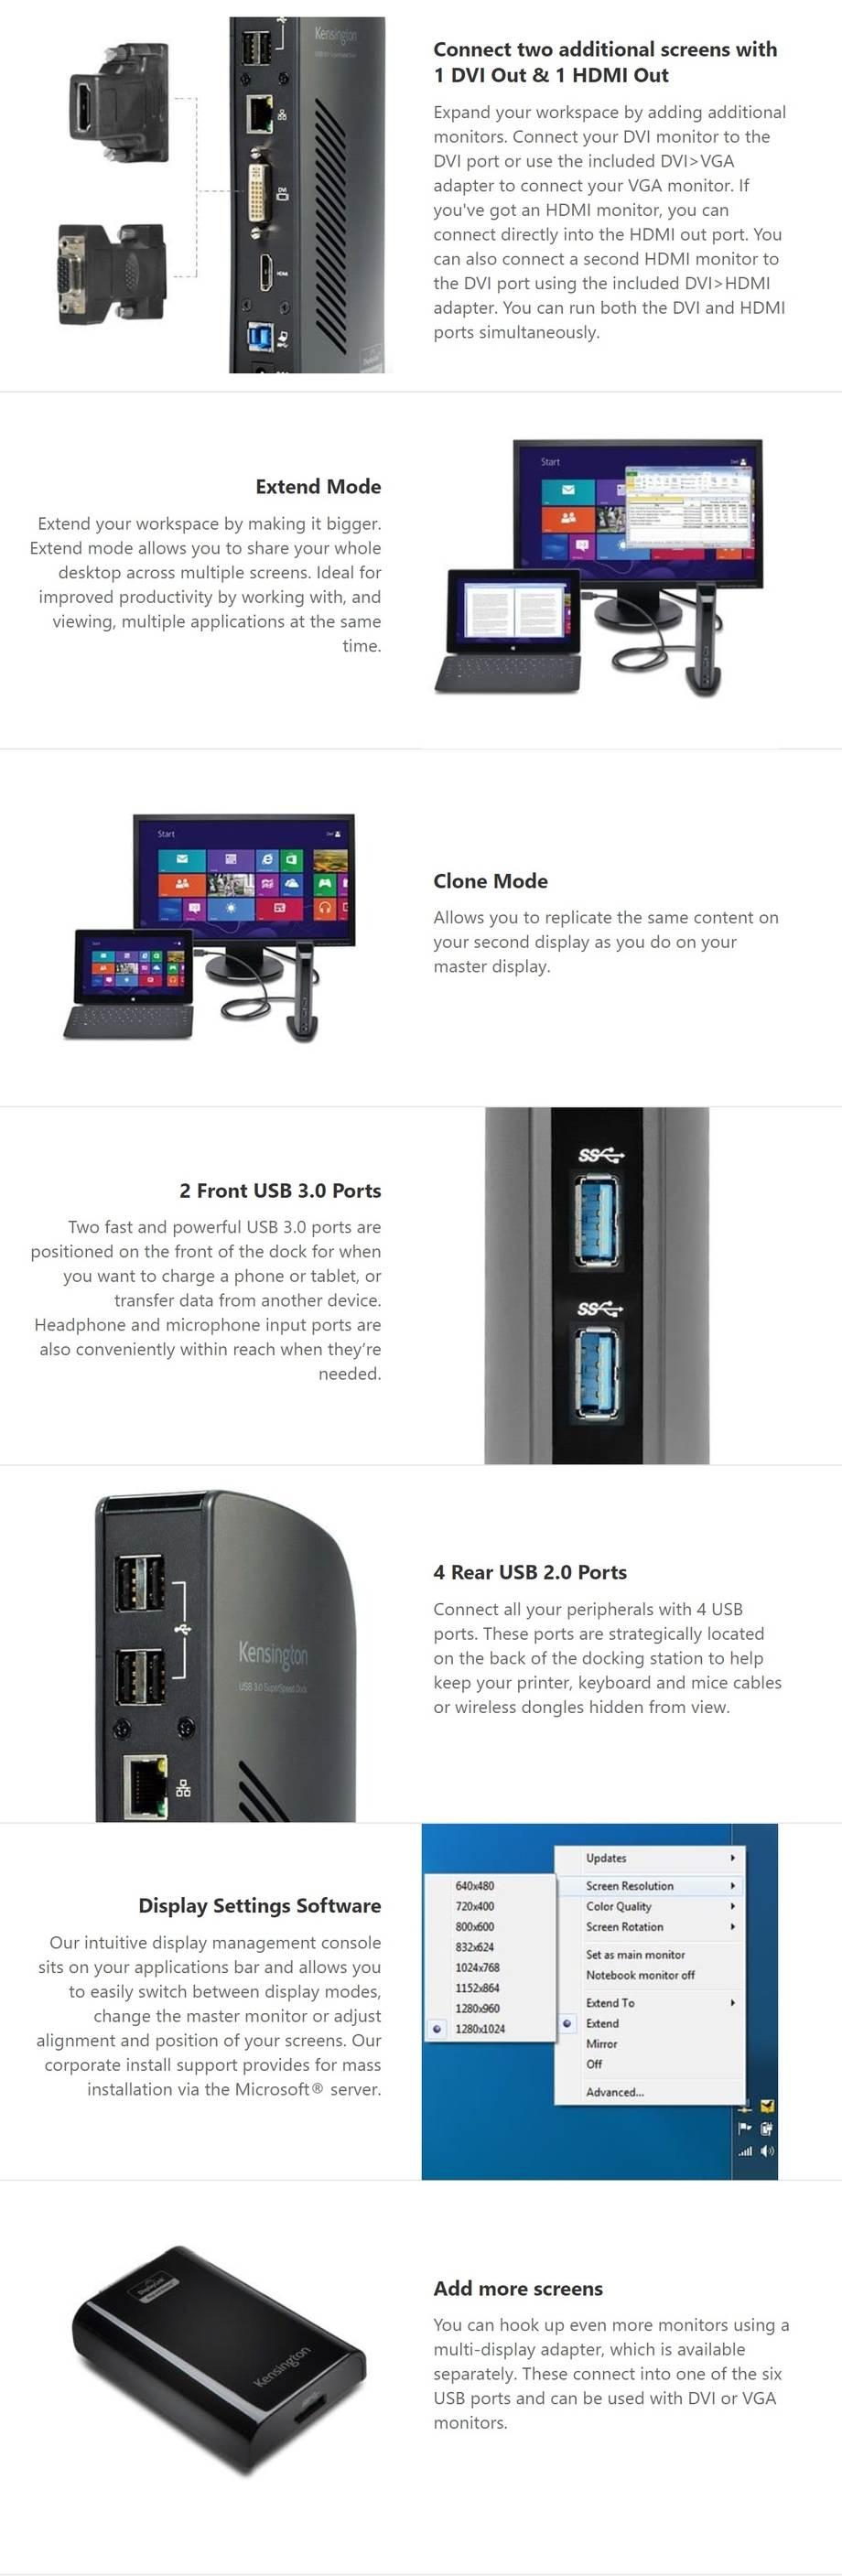 Kensington SD3500V USB 3 0 Docking Station with Dual DVI/HDMI/VGA Video